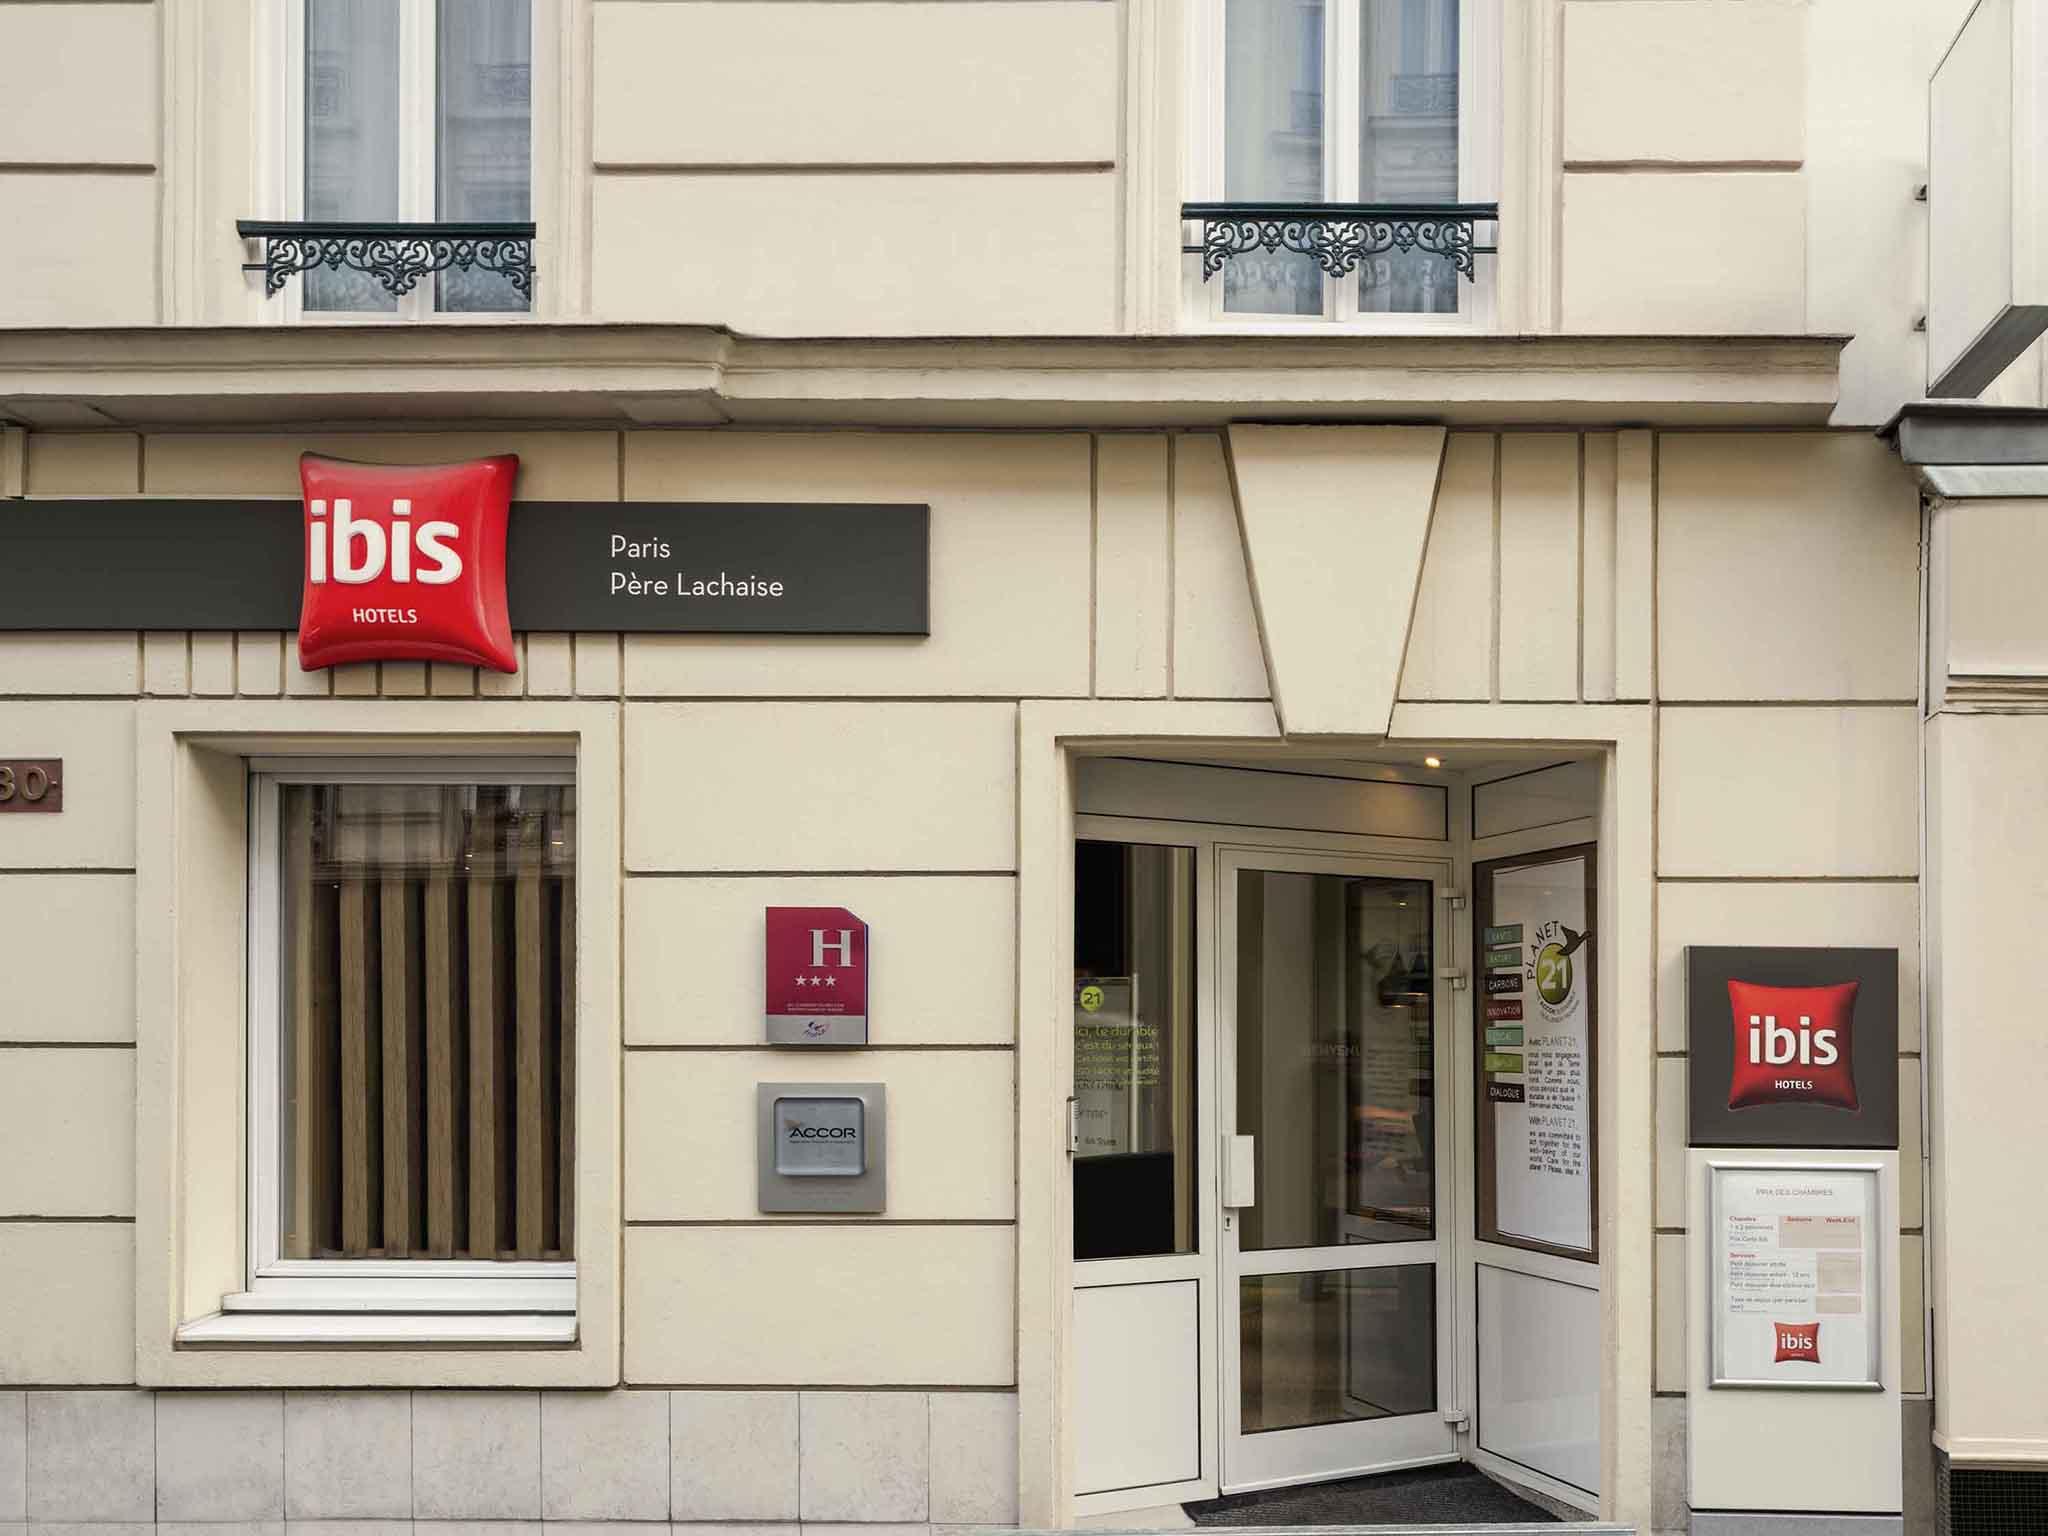 Hotel – ibis París Pere Lachaise